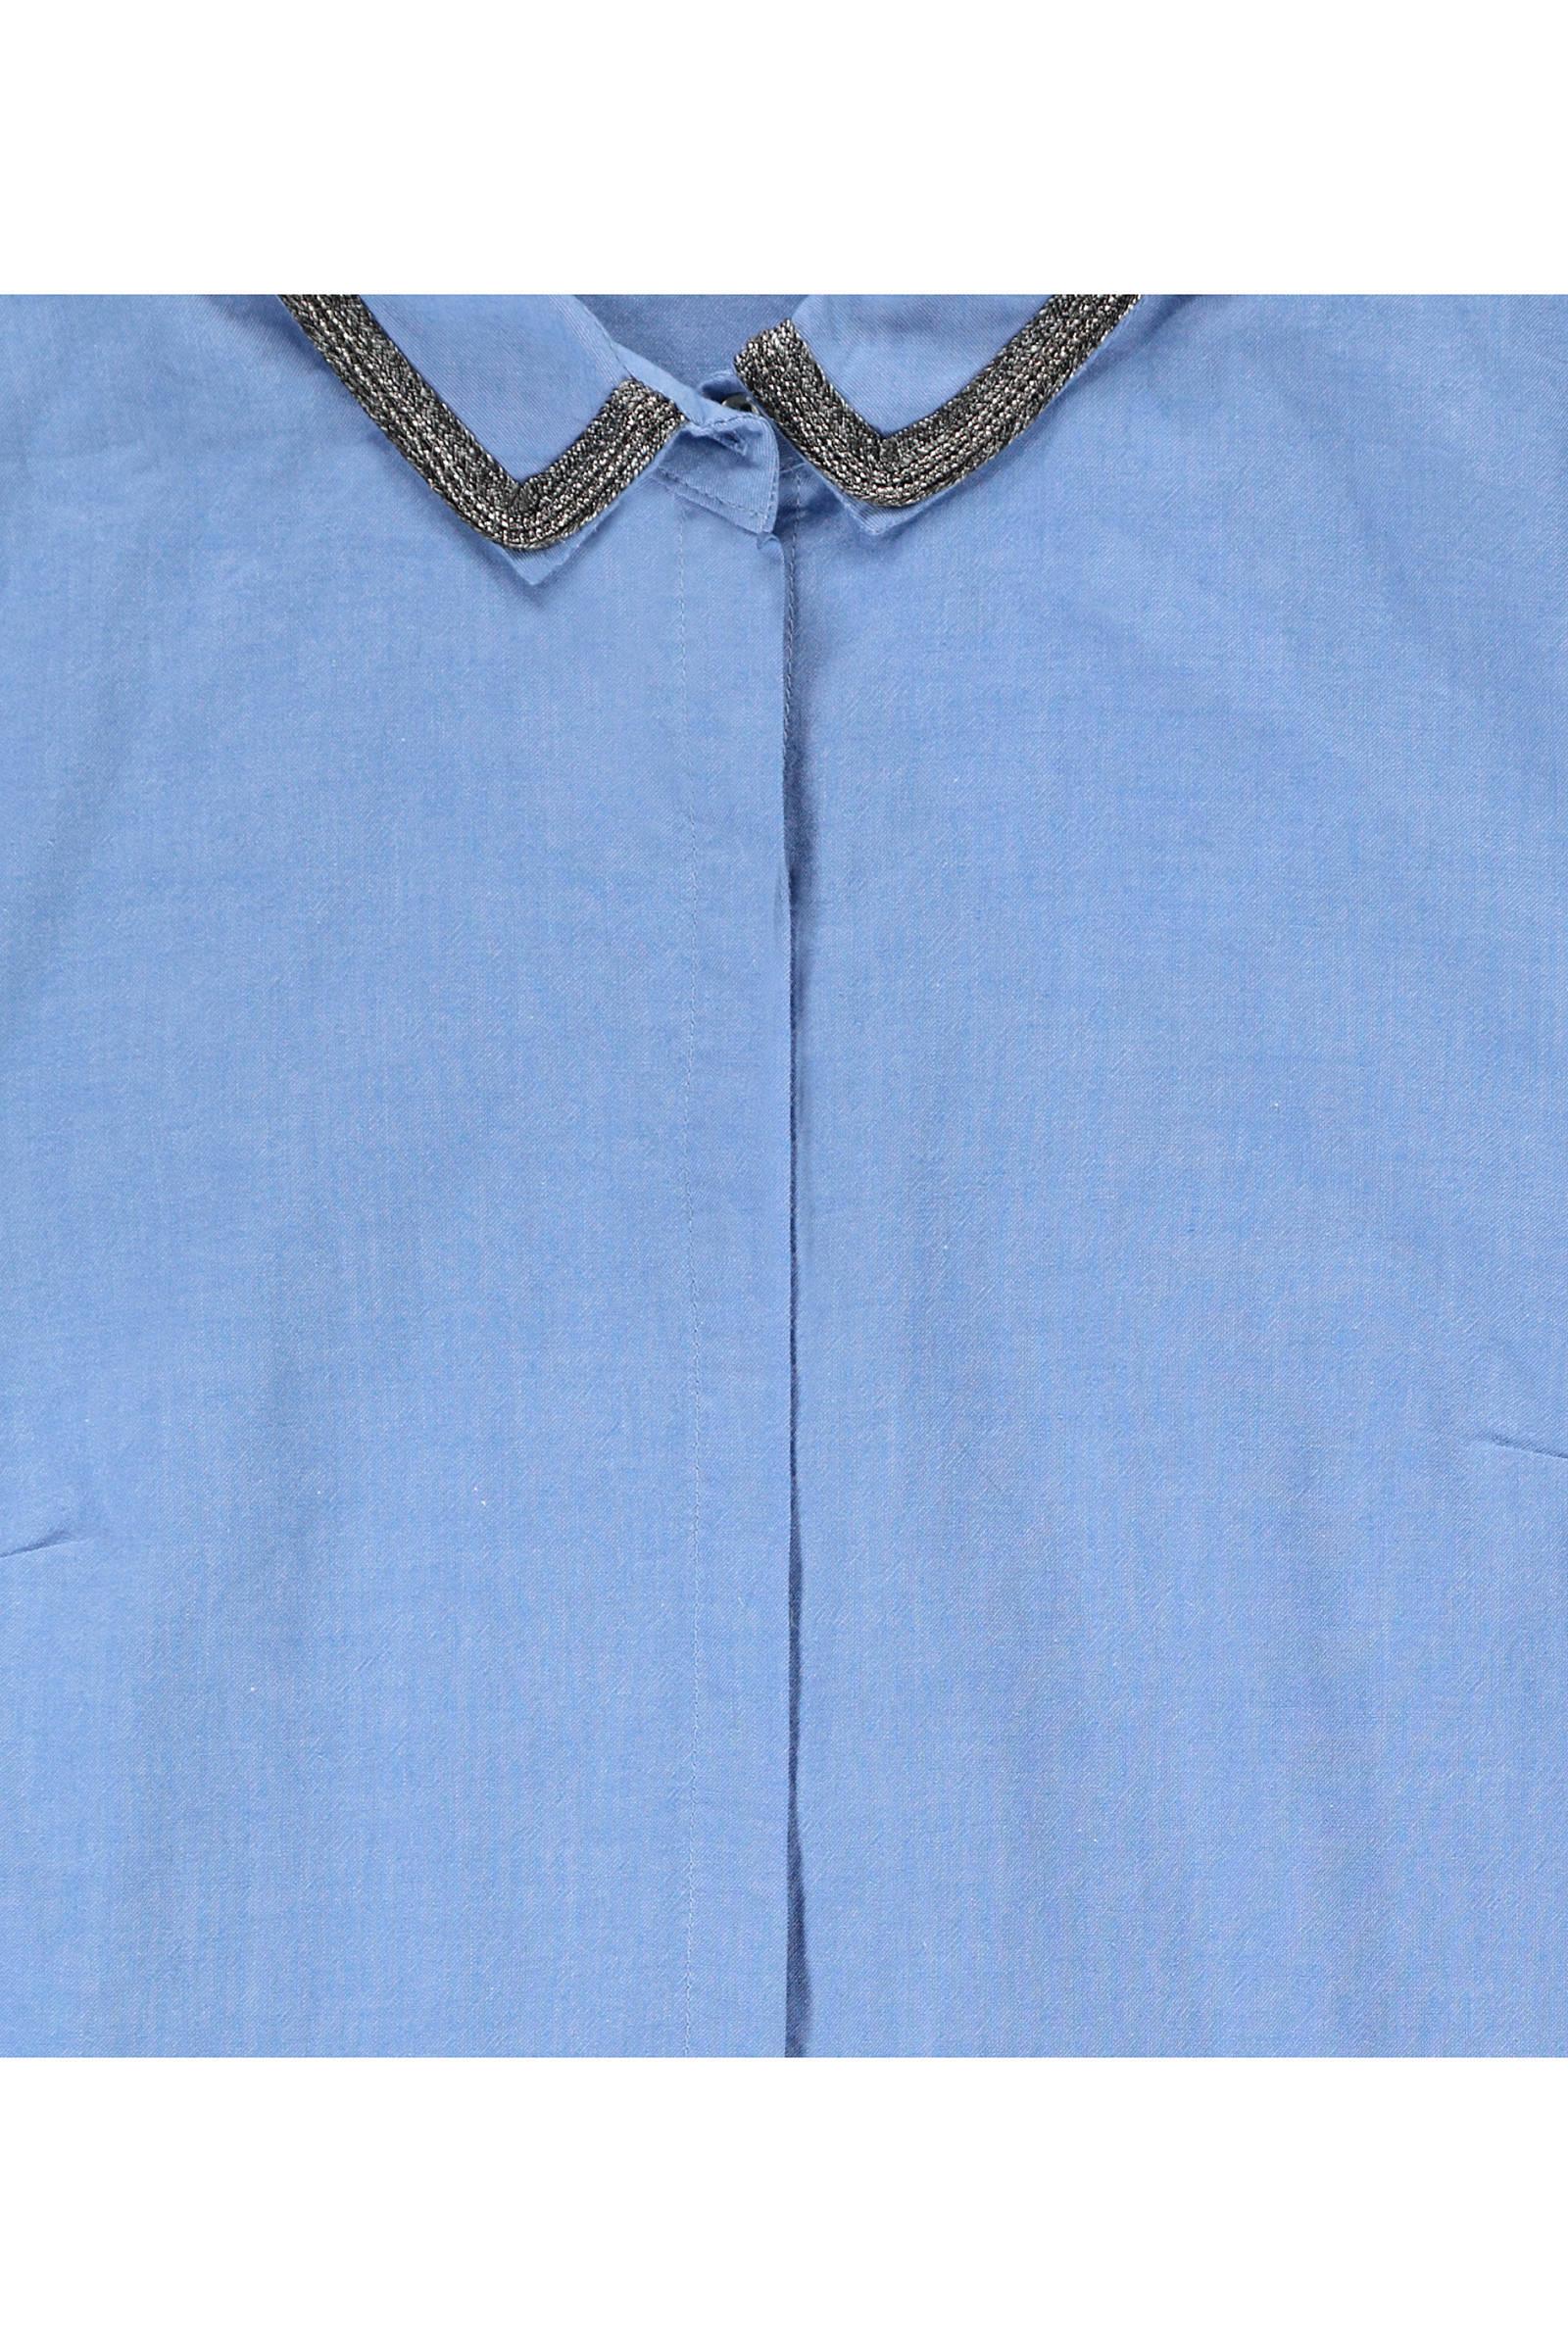 CKS blouse lichtblauw lichtblauw lichtblauw blouse Marjanne blouse Marjanne CKS Marjanne CKS qXUwrq7B